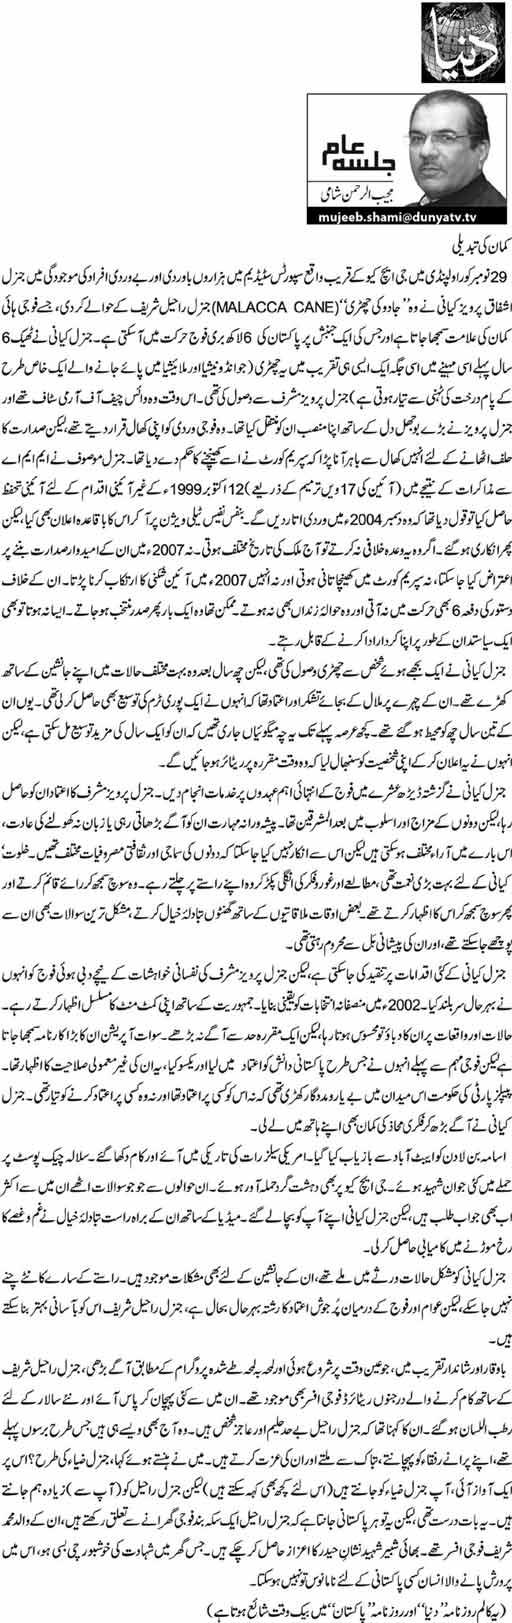 Kaman Ki Tabdeeli - Mujeeb ur Rehman Shami